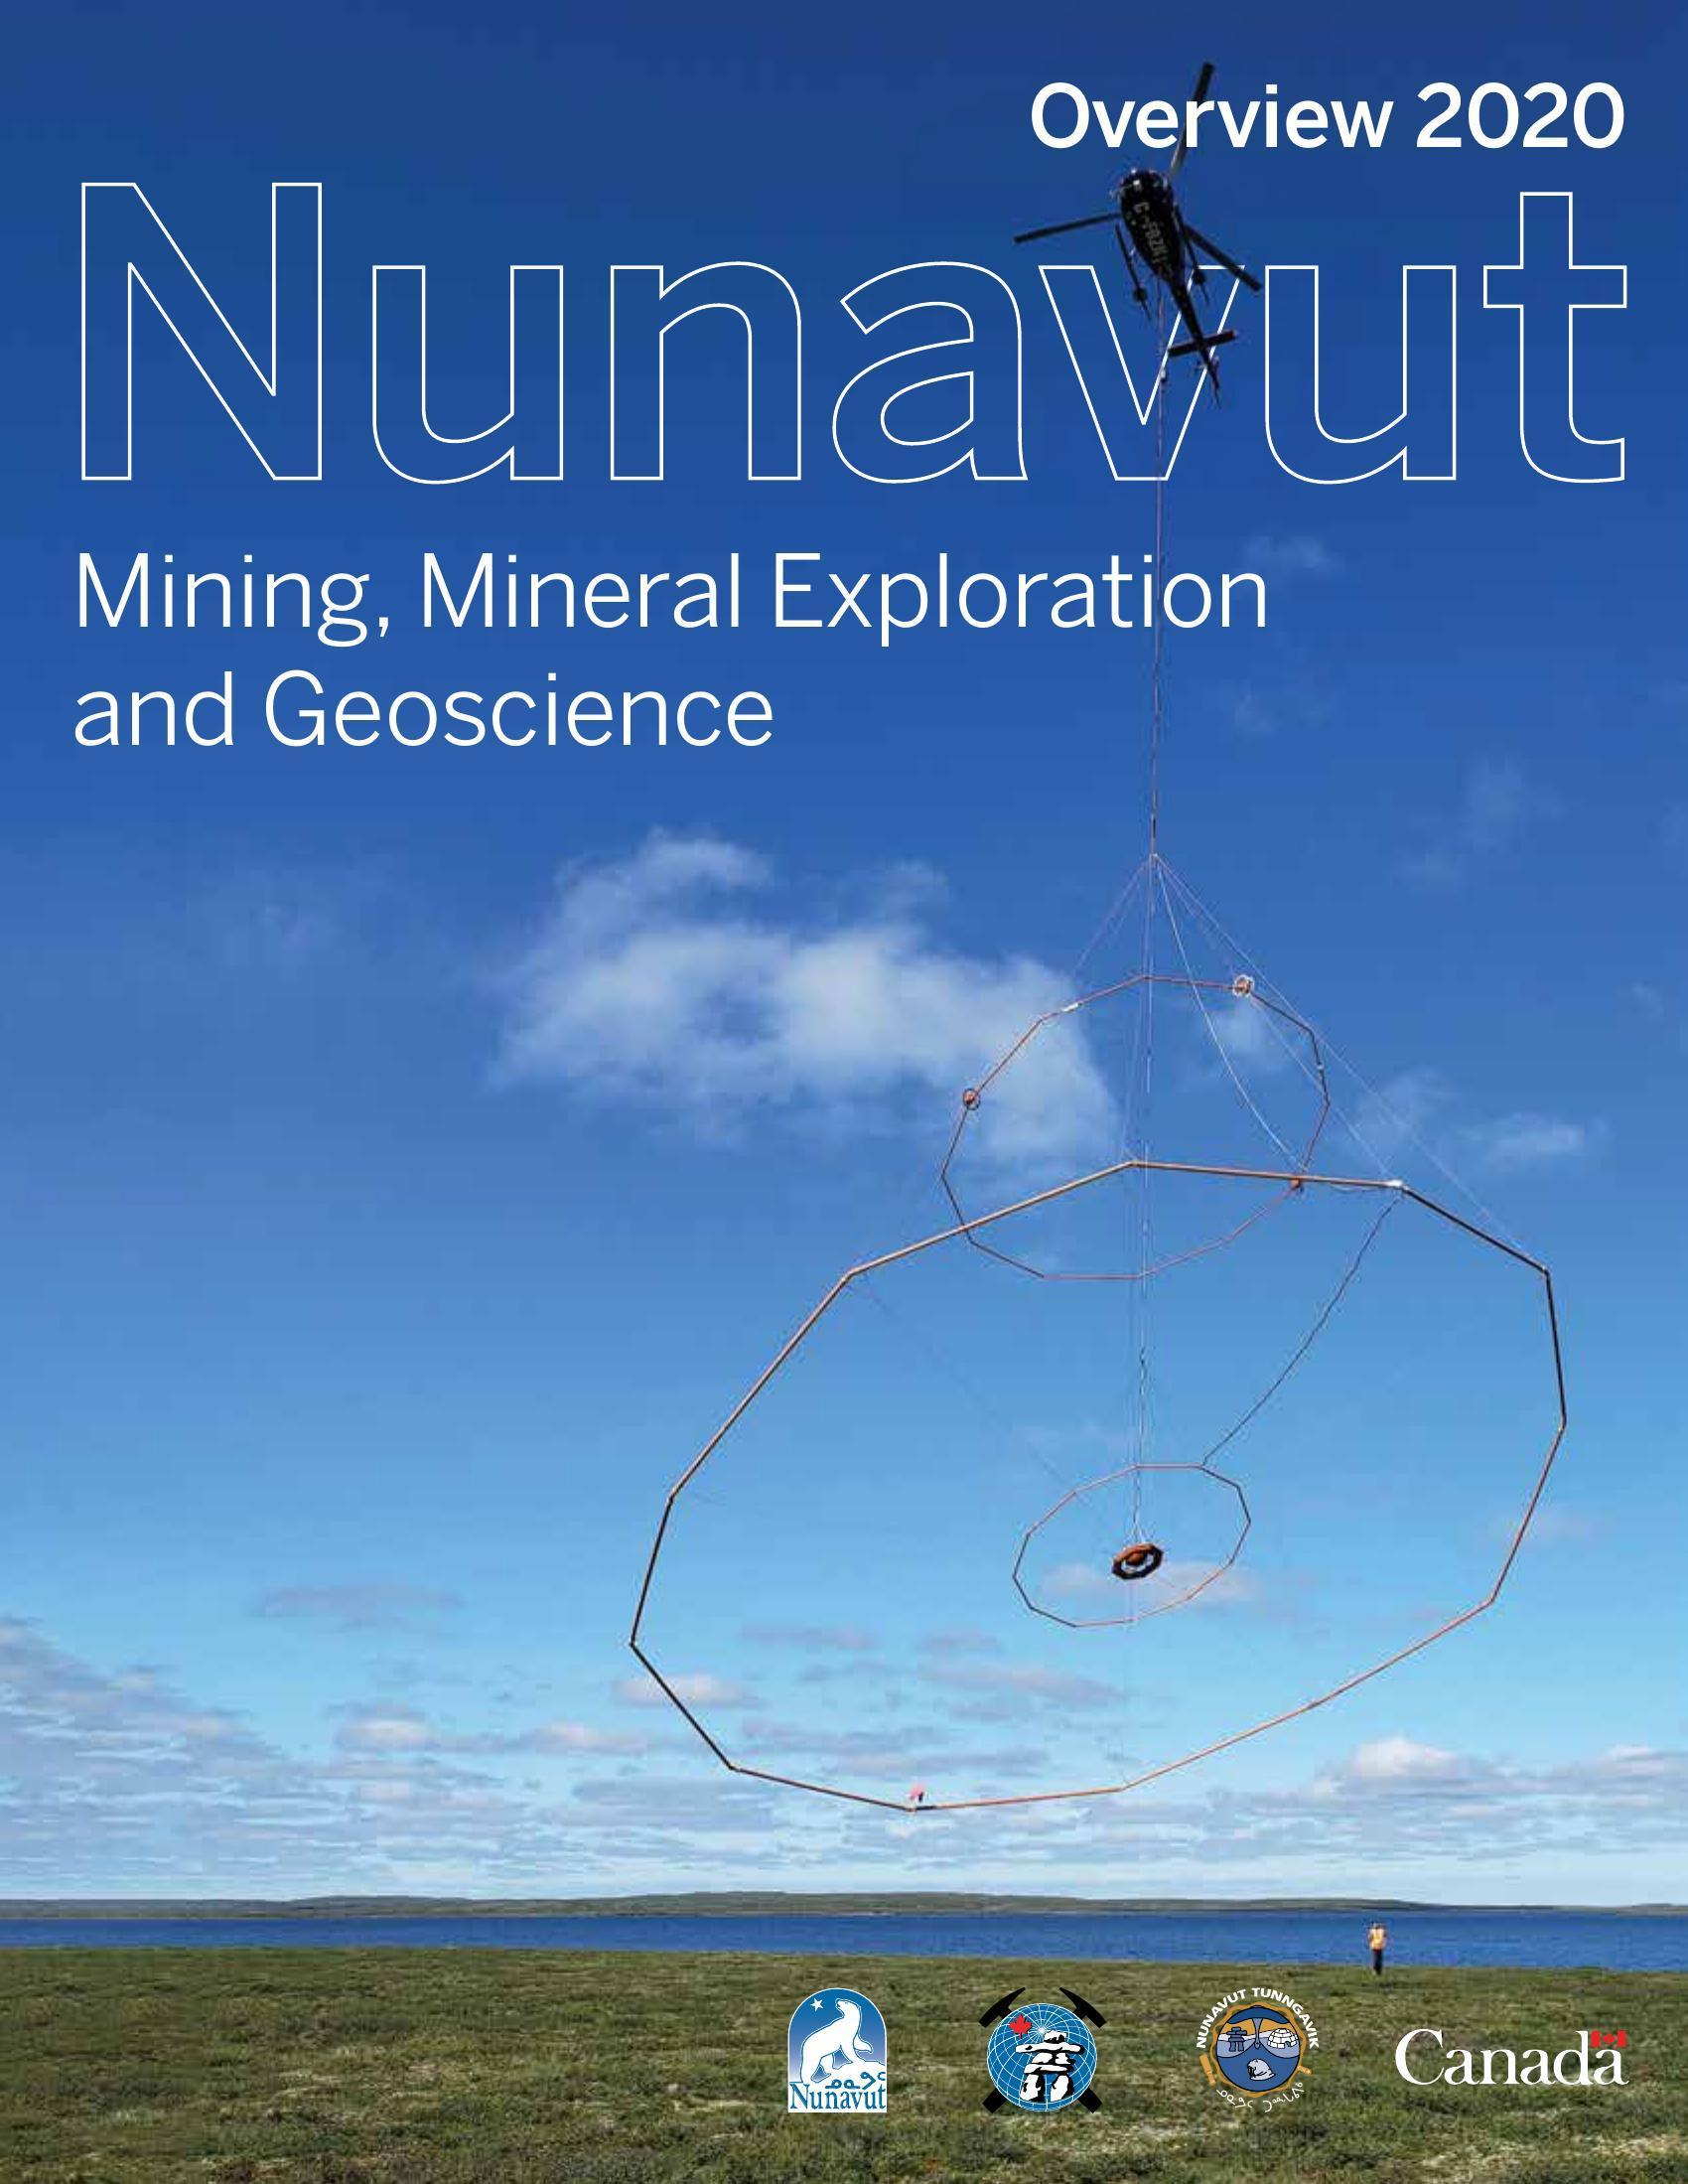 Exploration Overview 2020